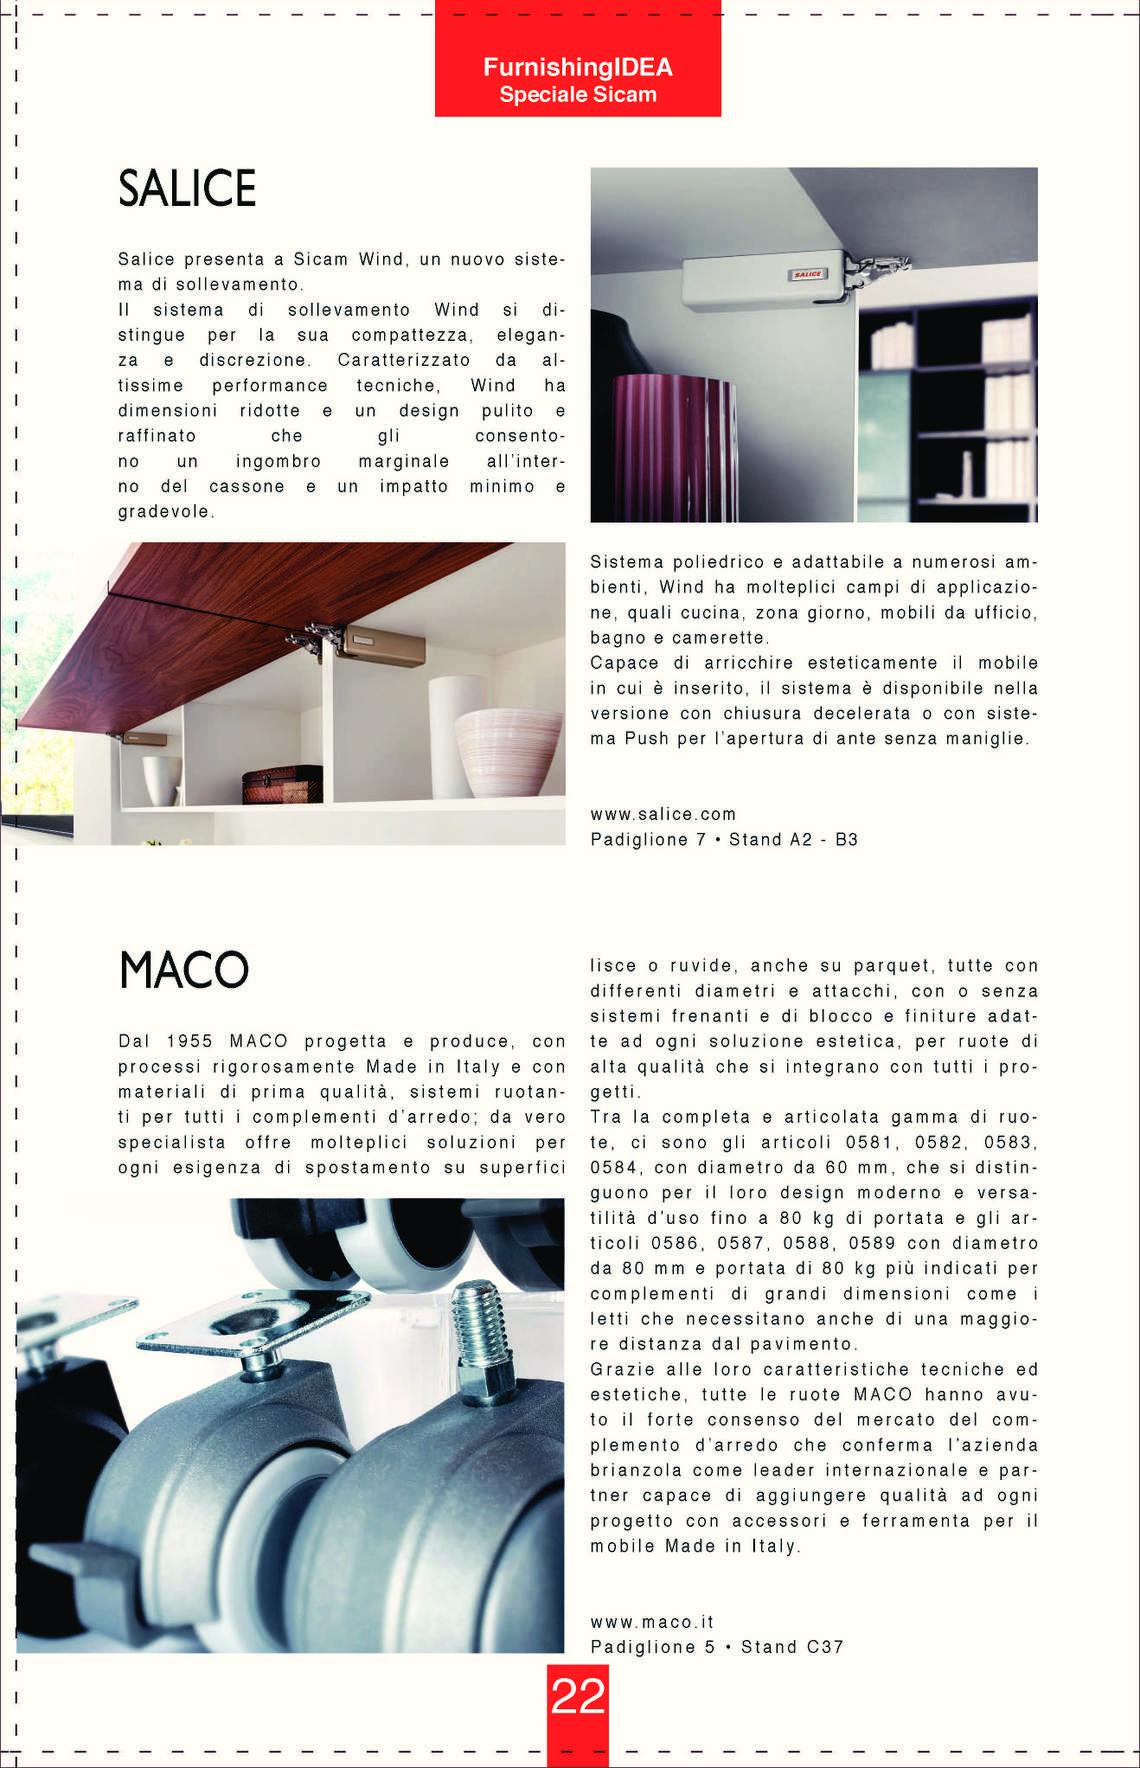 sicam-2016_journal_4_021.jpg